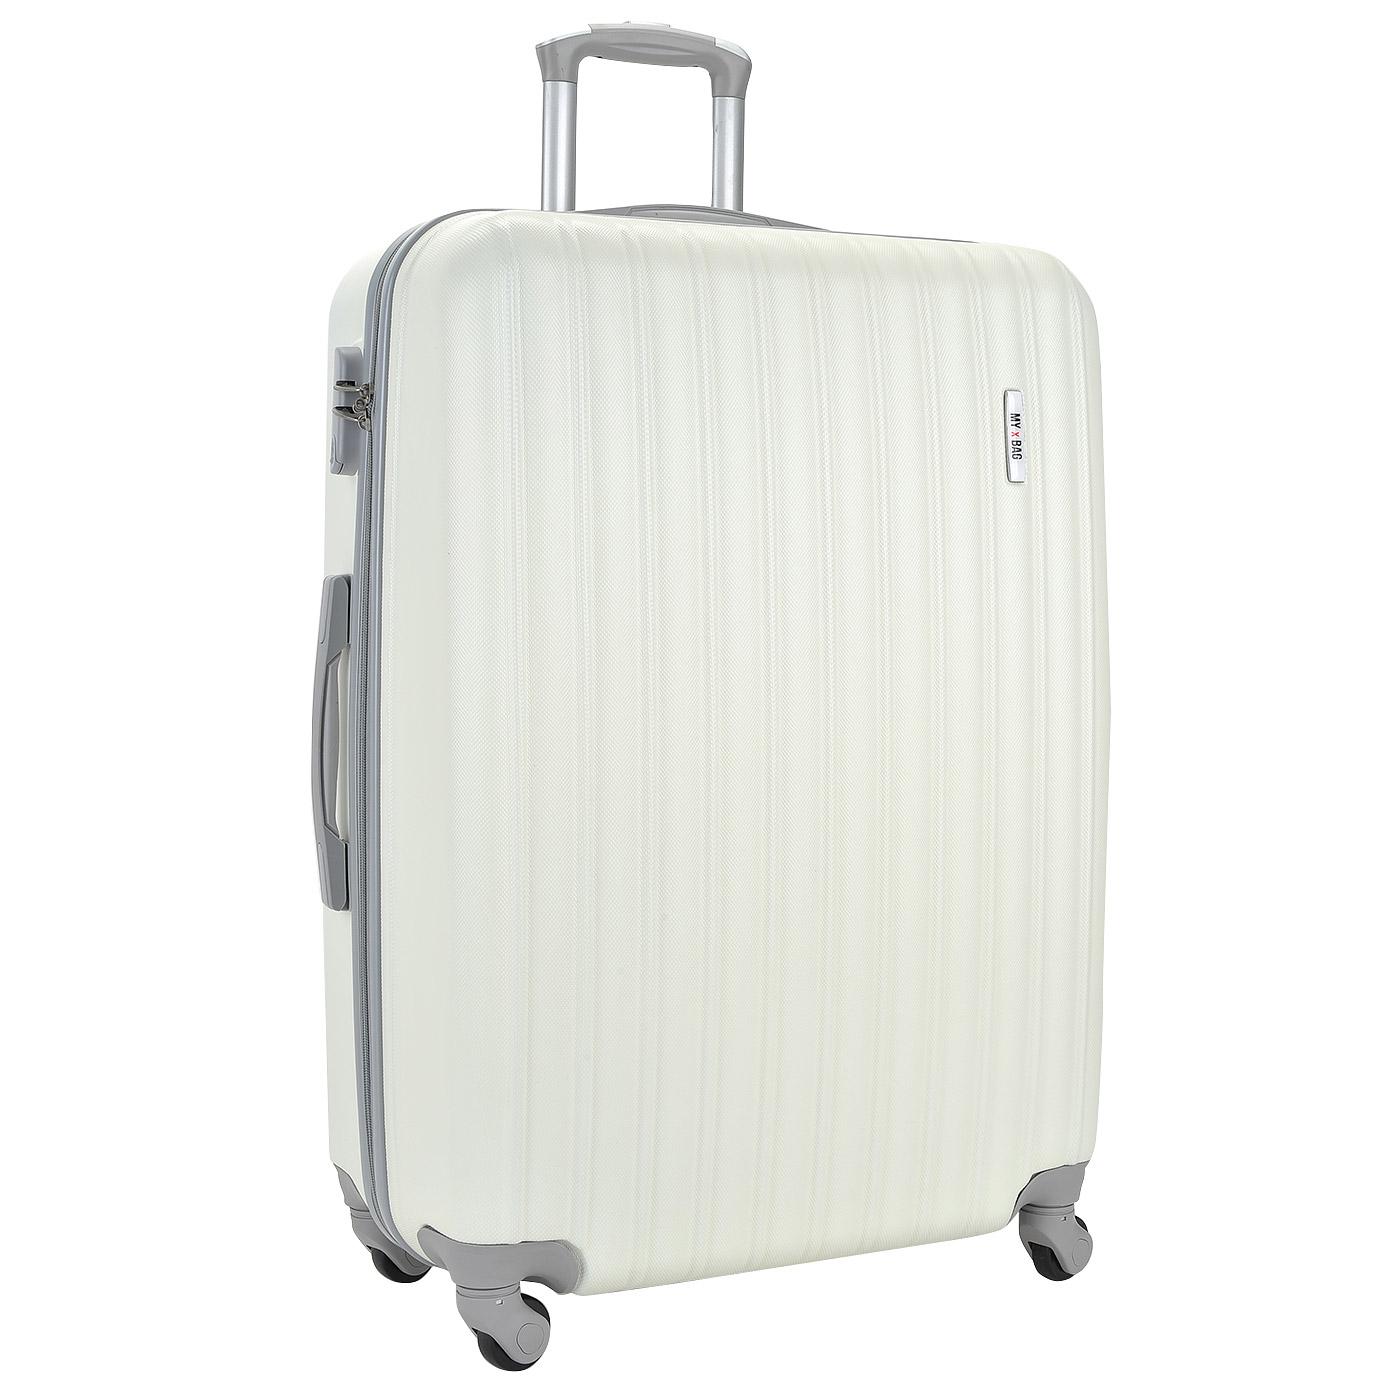 Чемодан на колесах MyxBag MXB-white-L-i - 2000557800427 белый ABS ... 7e564cc4e75